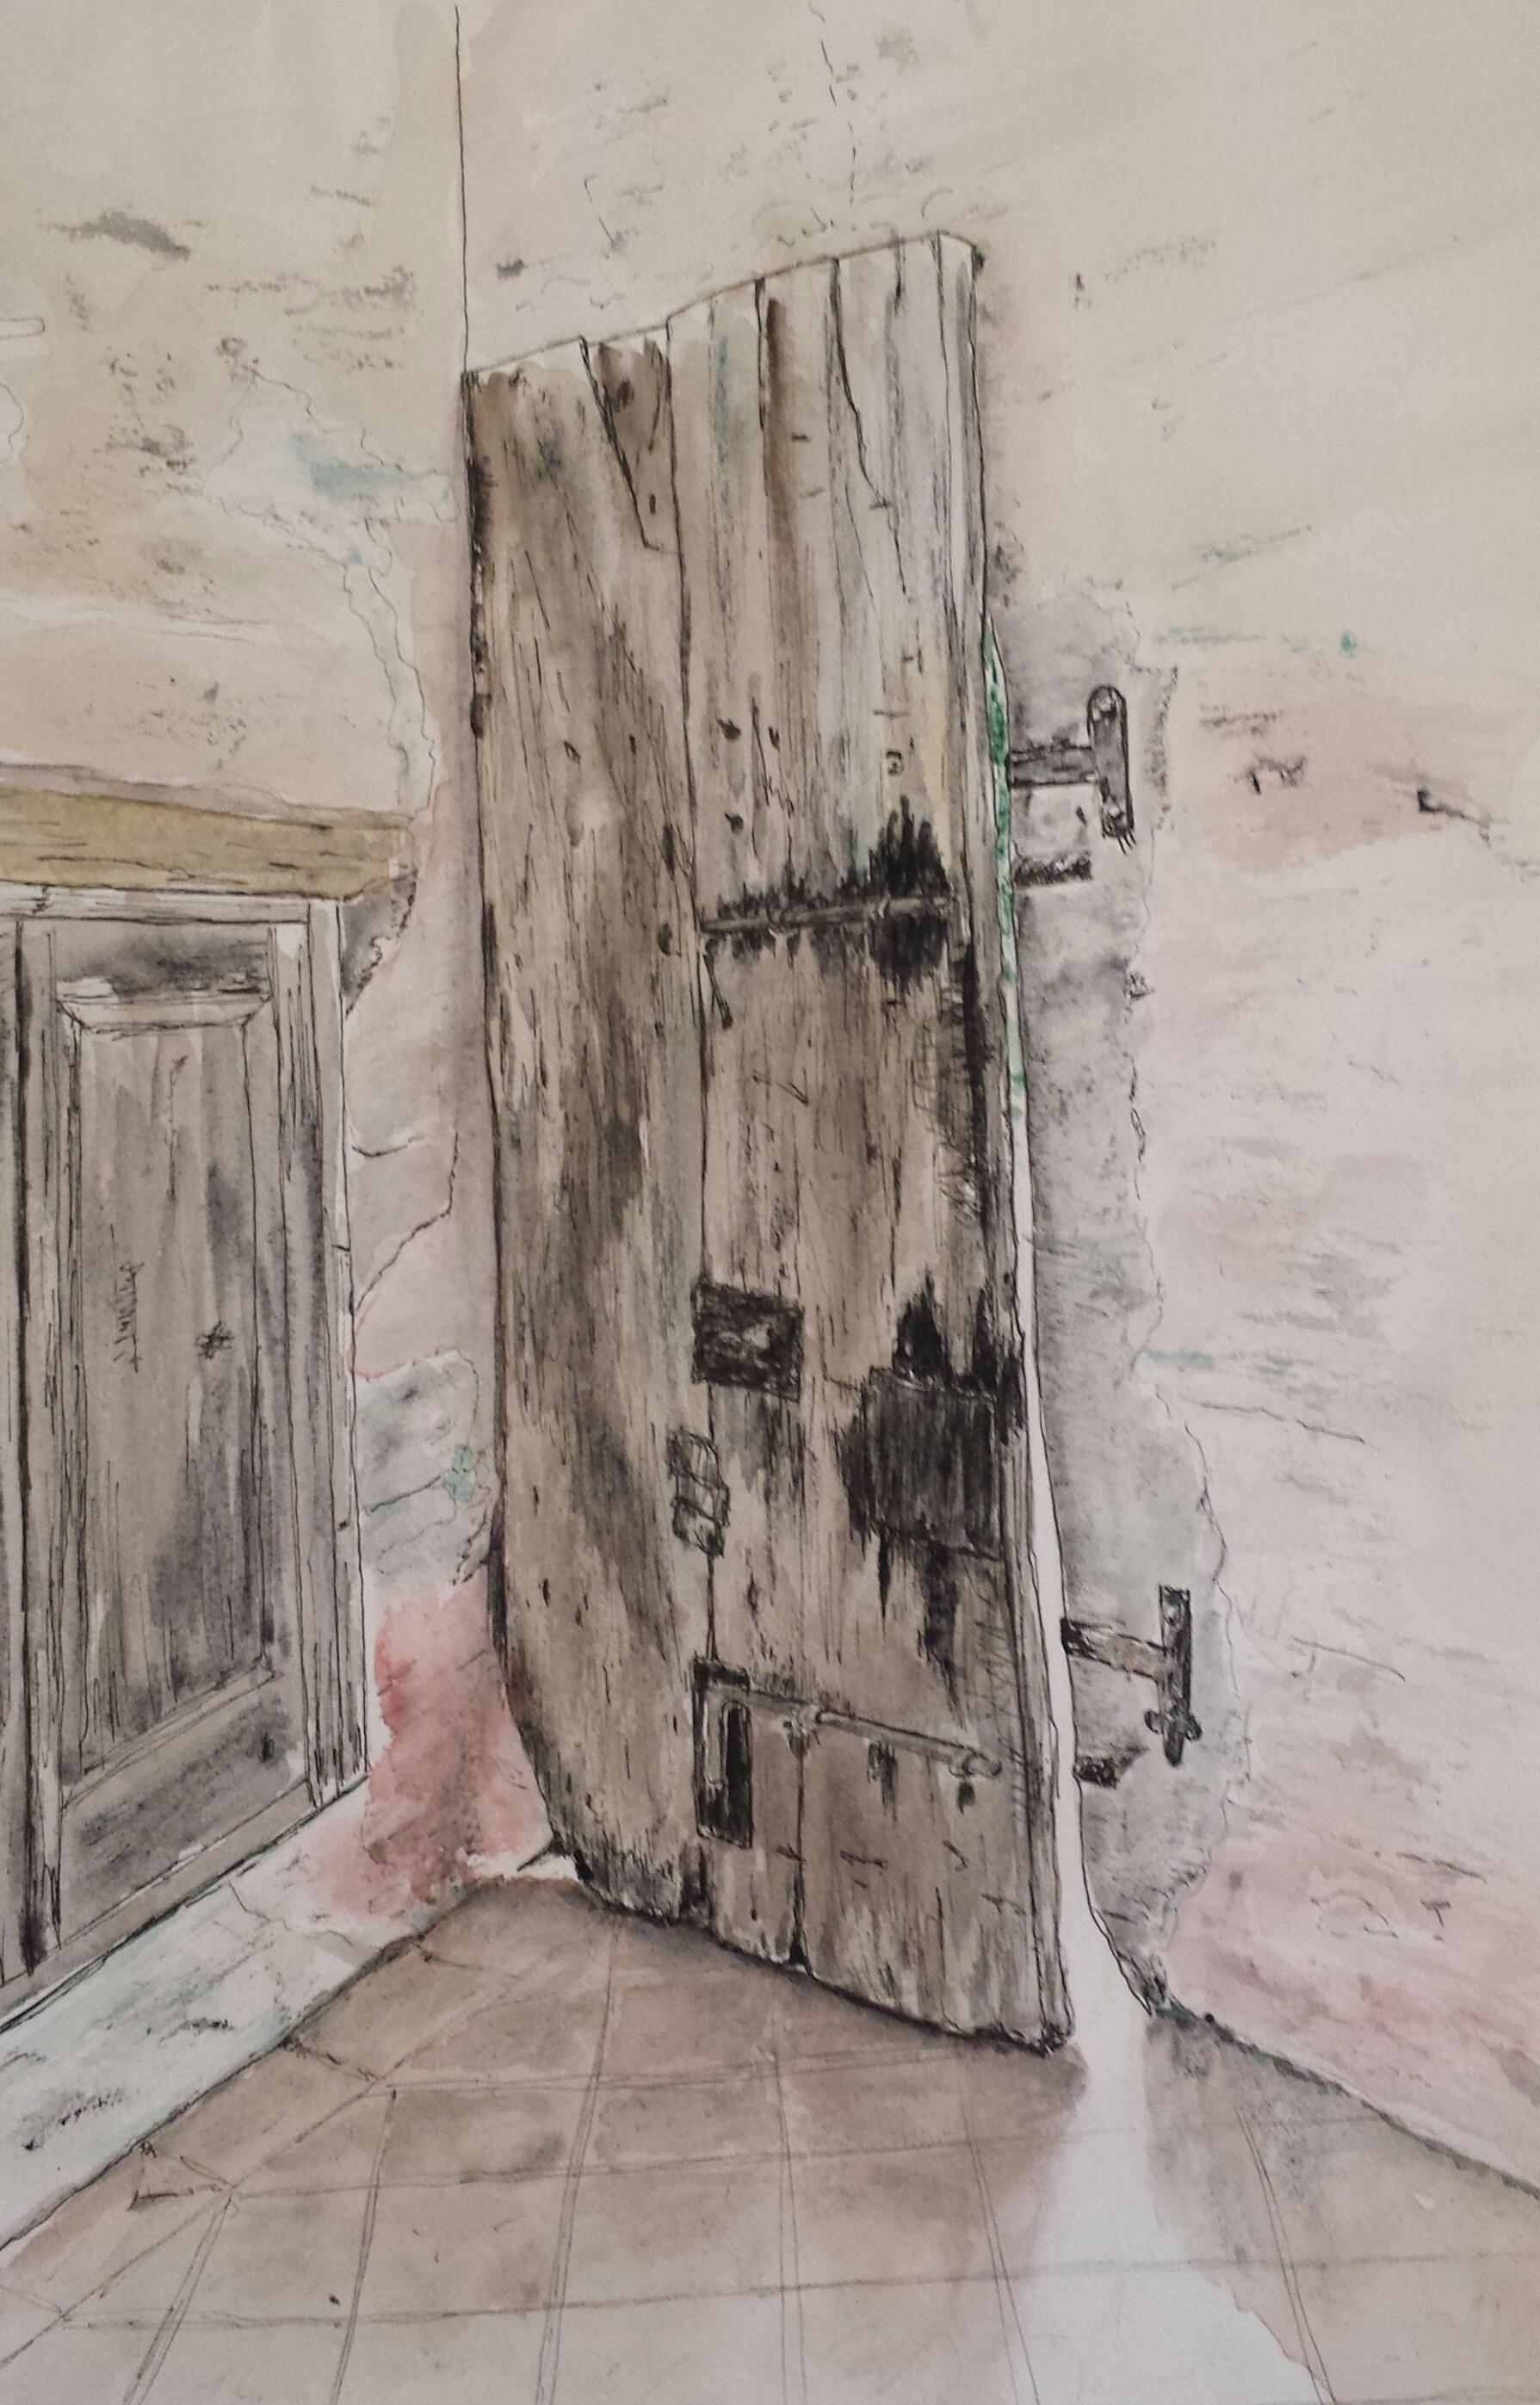 Castle Door II, Orzinuovi, Italy, 2016, pen and wash.